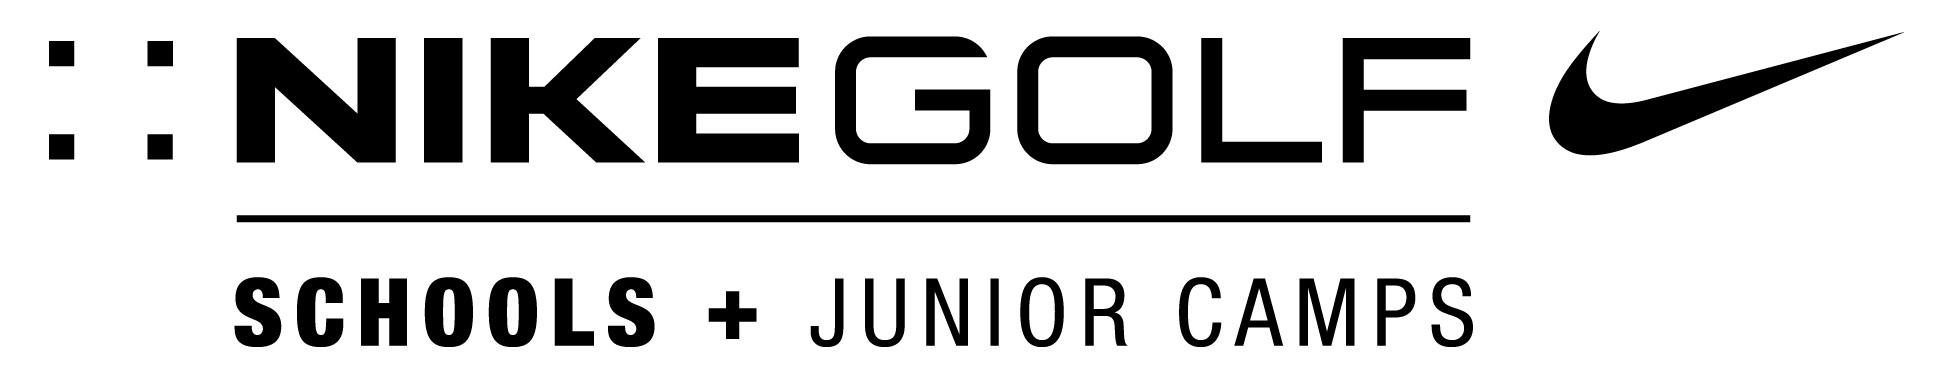 NIKE Junior Golf Camps, Samford University